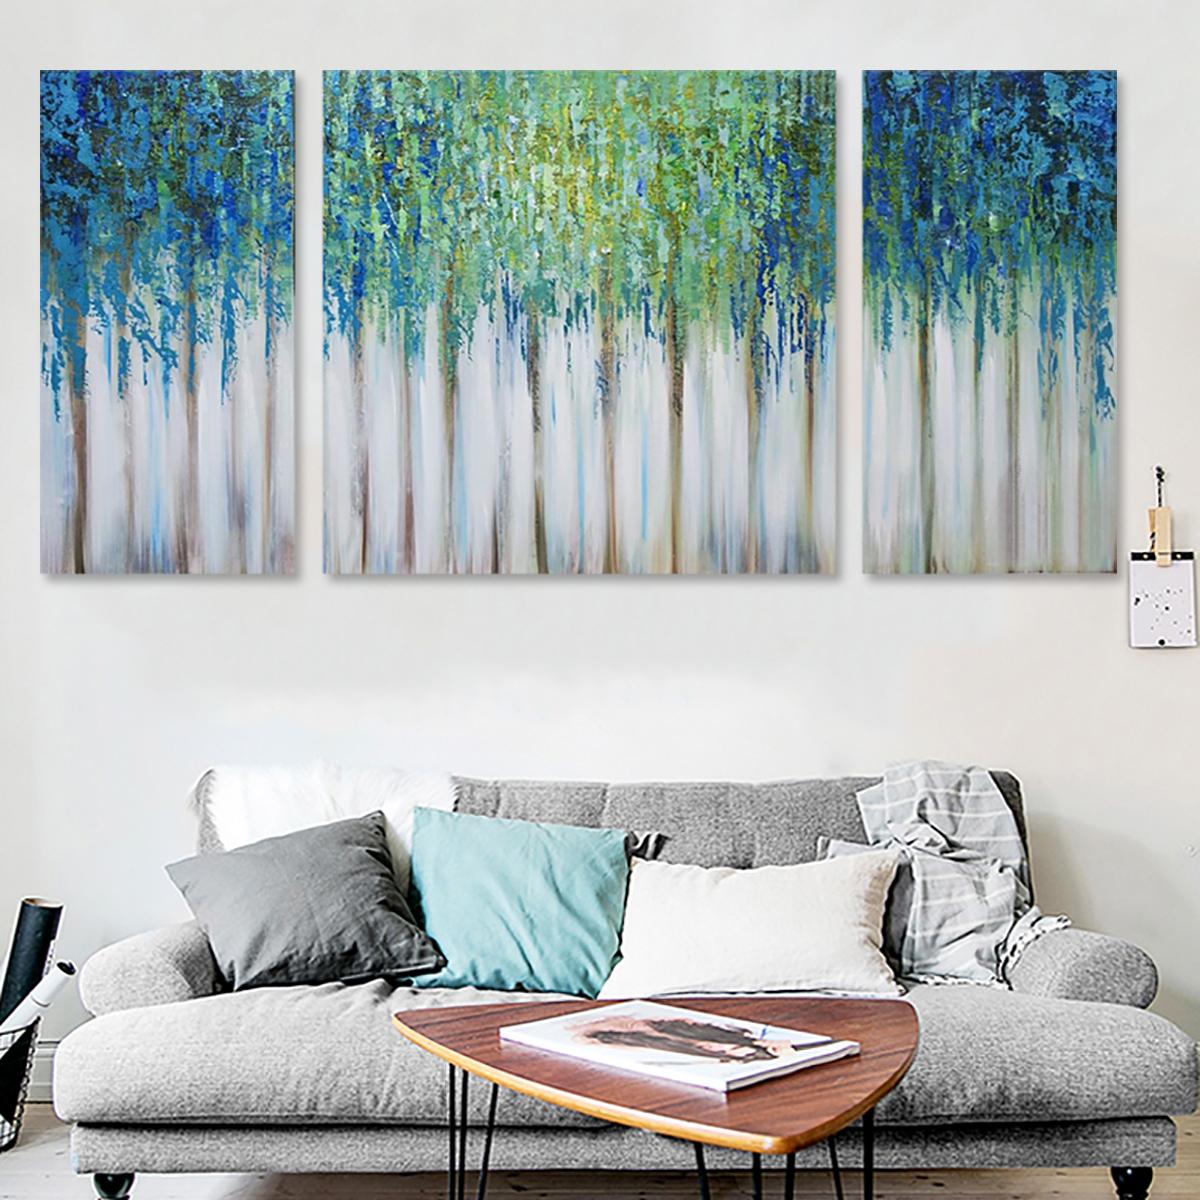 Abstract-Modern-Oil-Painting-Art-Canvas-Print-Wall-Home-Decor-Unframed-Framed